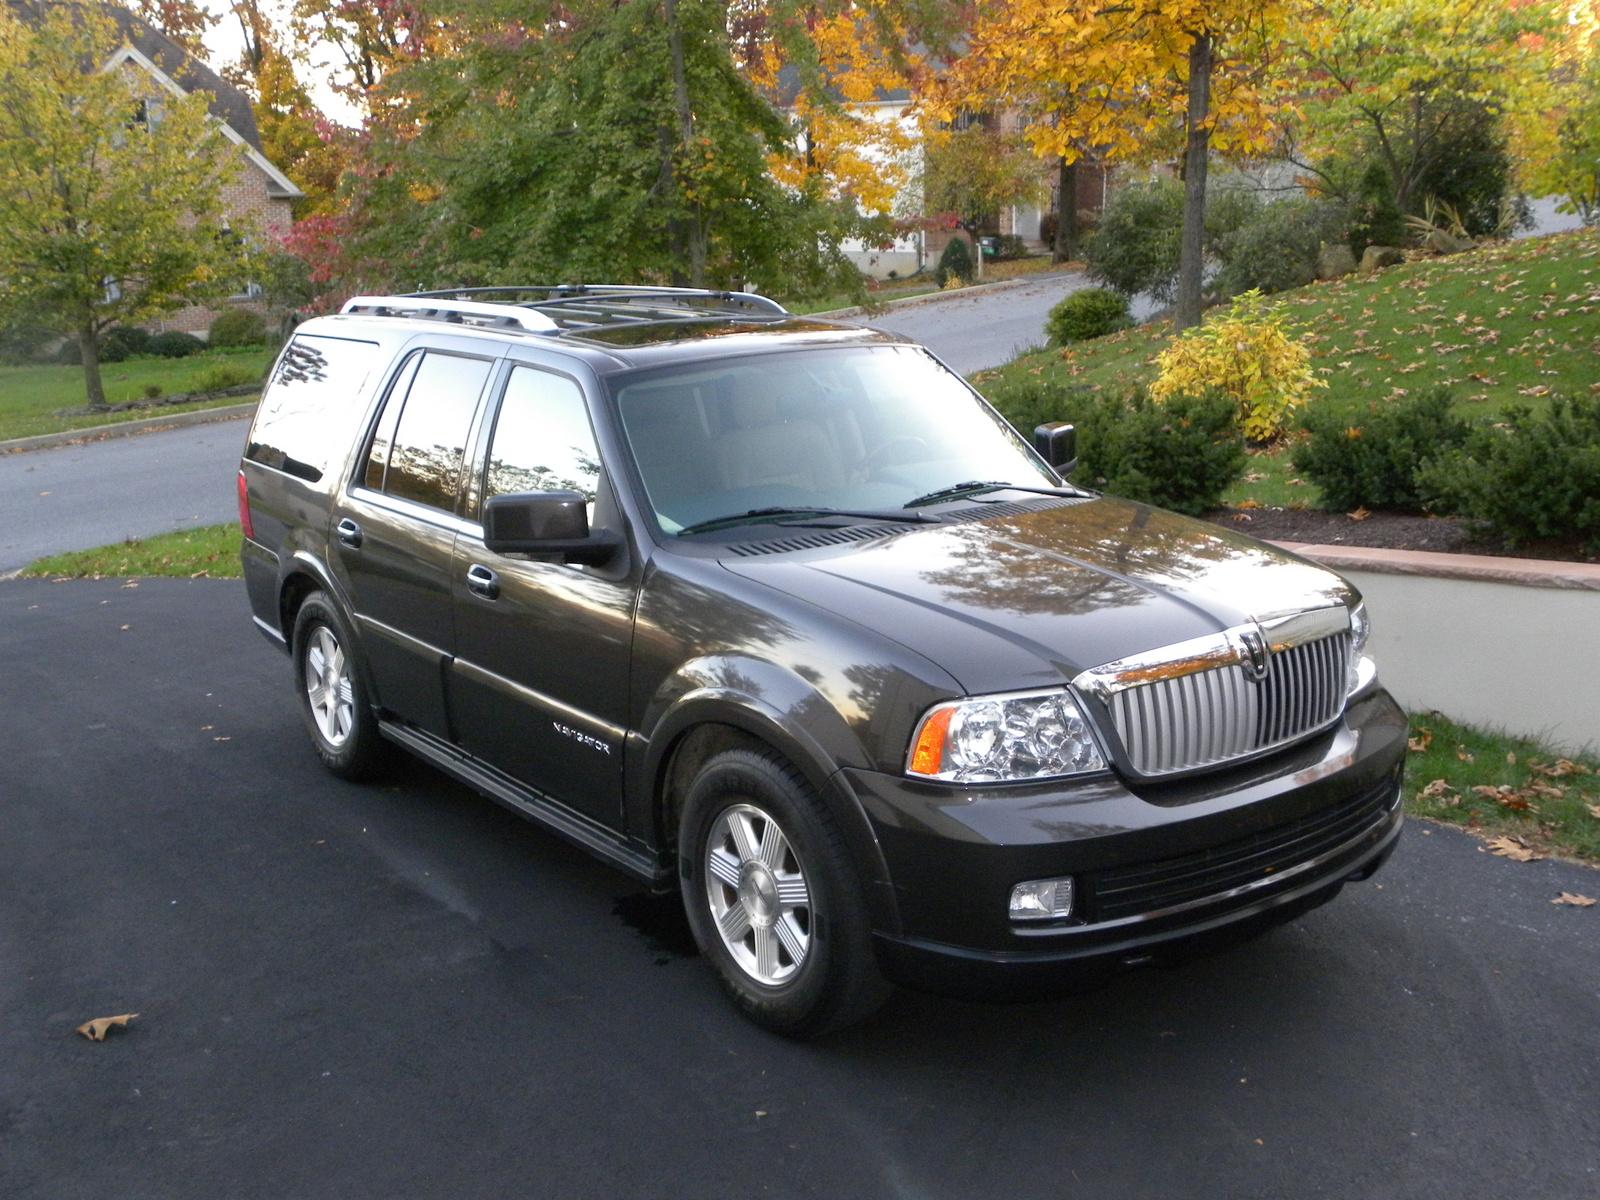 2005 Lincoln Navigator - Pictures - CarGurus